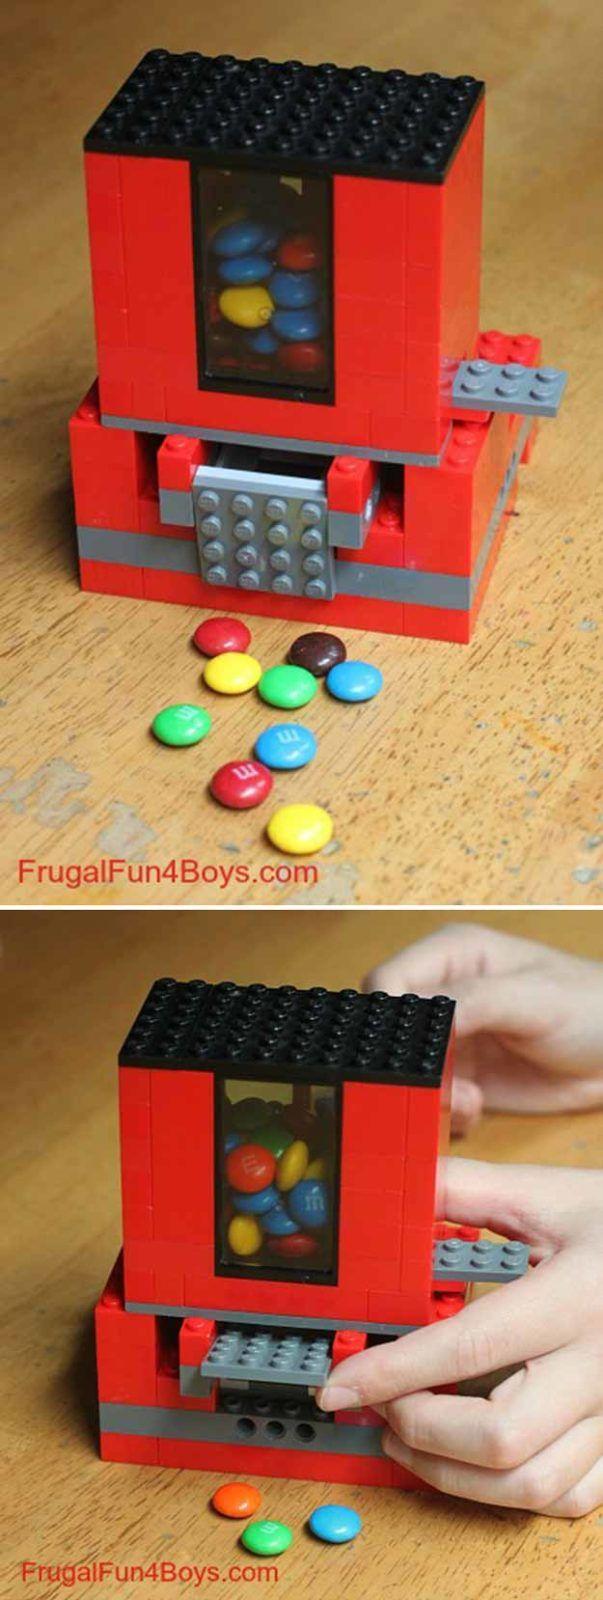 Fun and Easy DIY Lego Crafts for Boys | https://diyprojects.com/21-awesome-diy-lego-ideas/